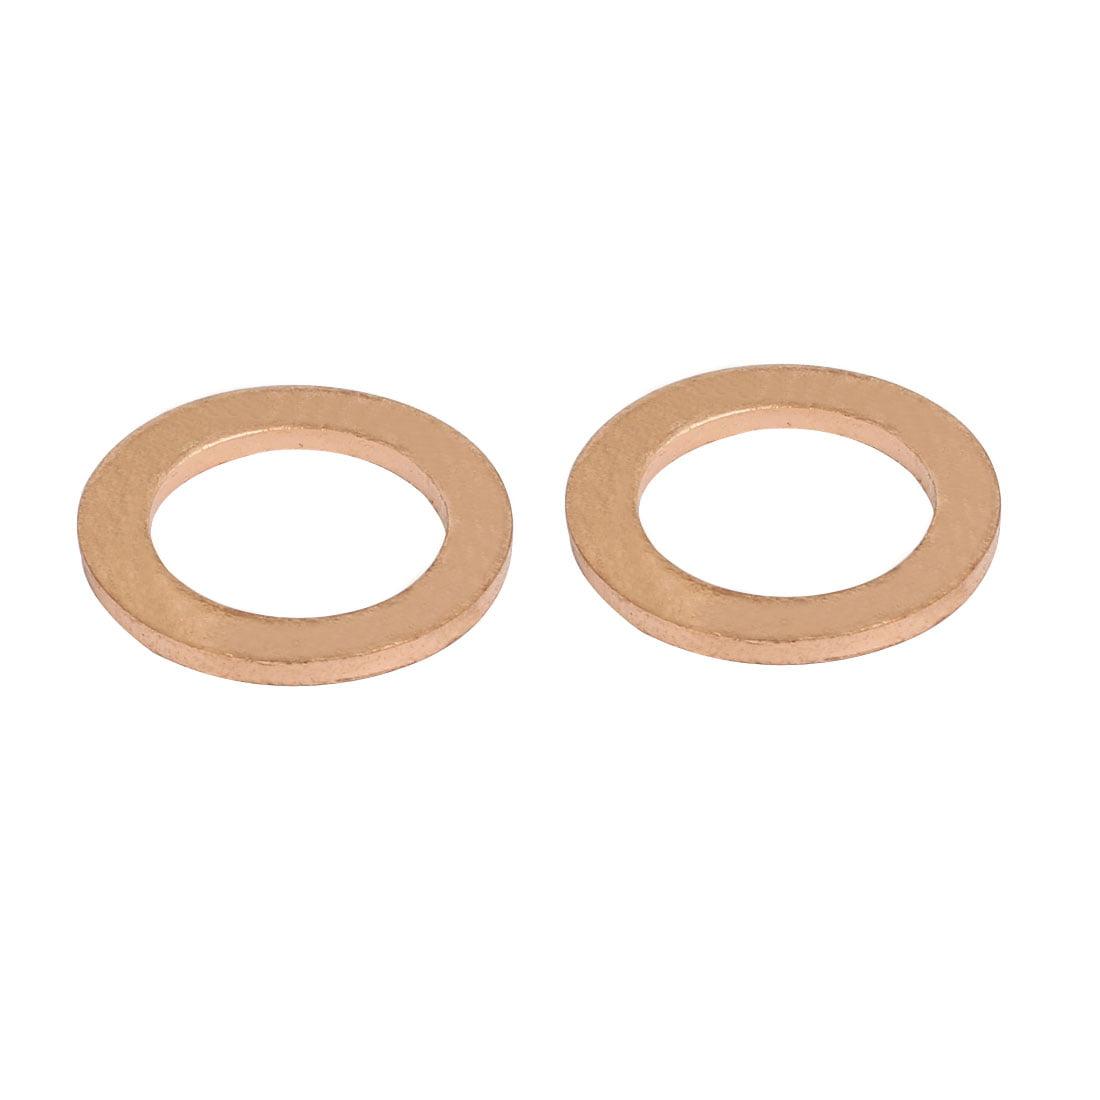 20pcs 12mmx20mmx1.5mm Copper Flat Ring Sealing Crush Washer Gasket - image 1 of 2